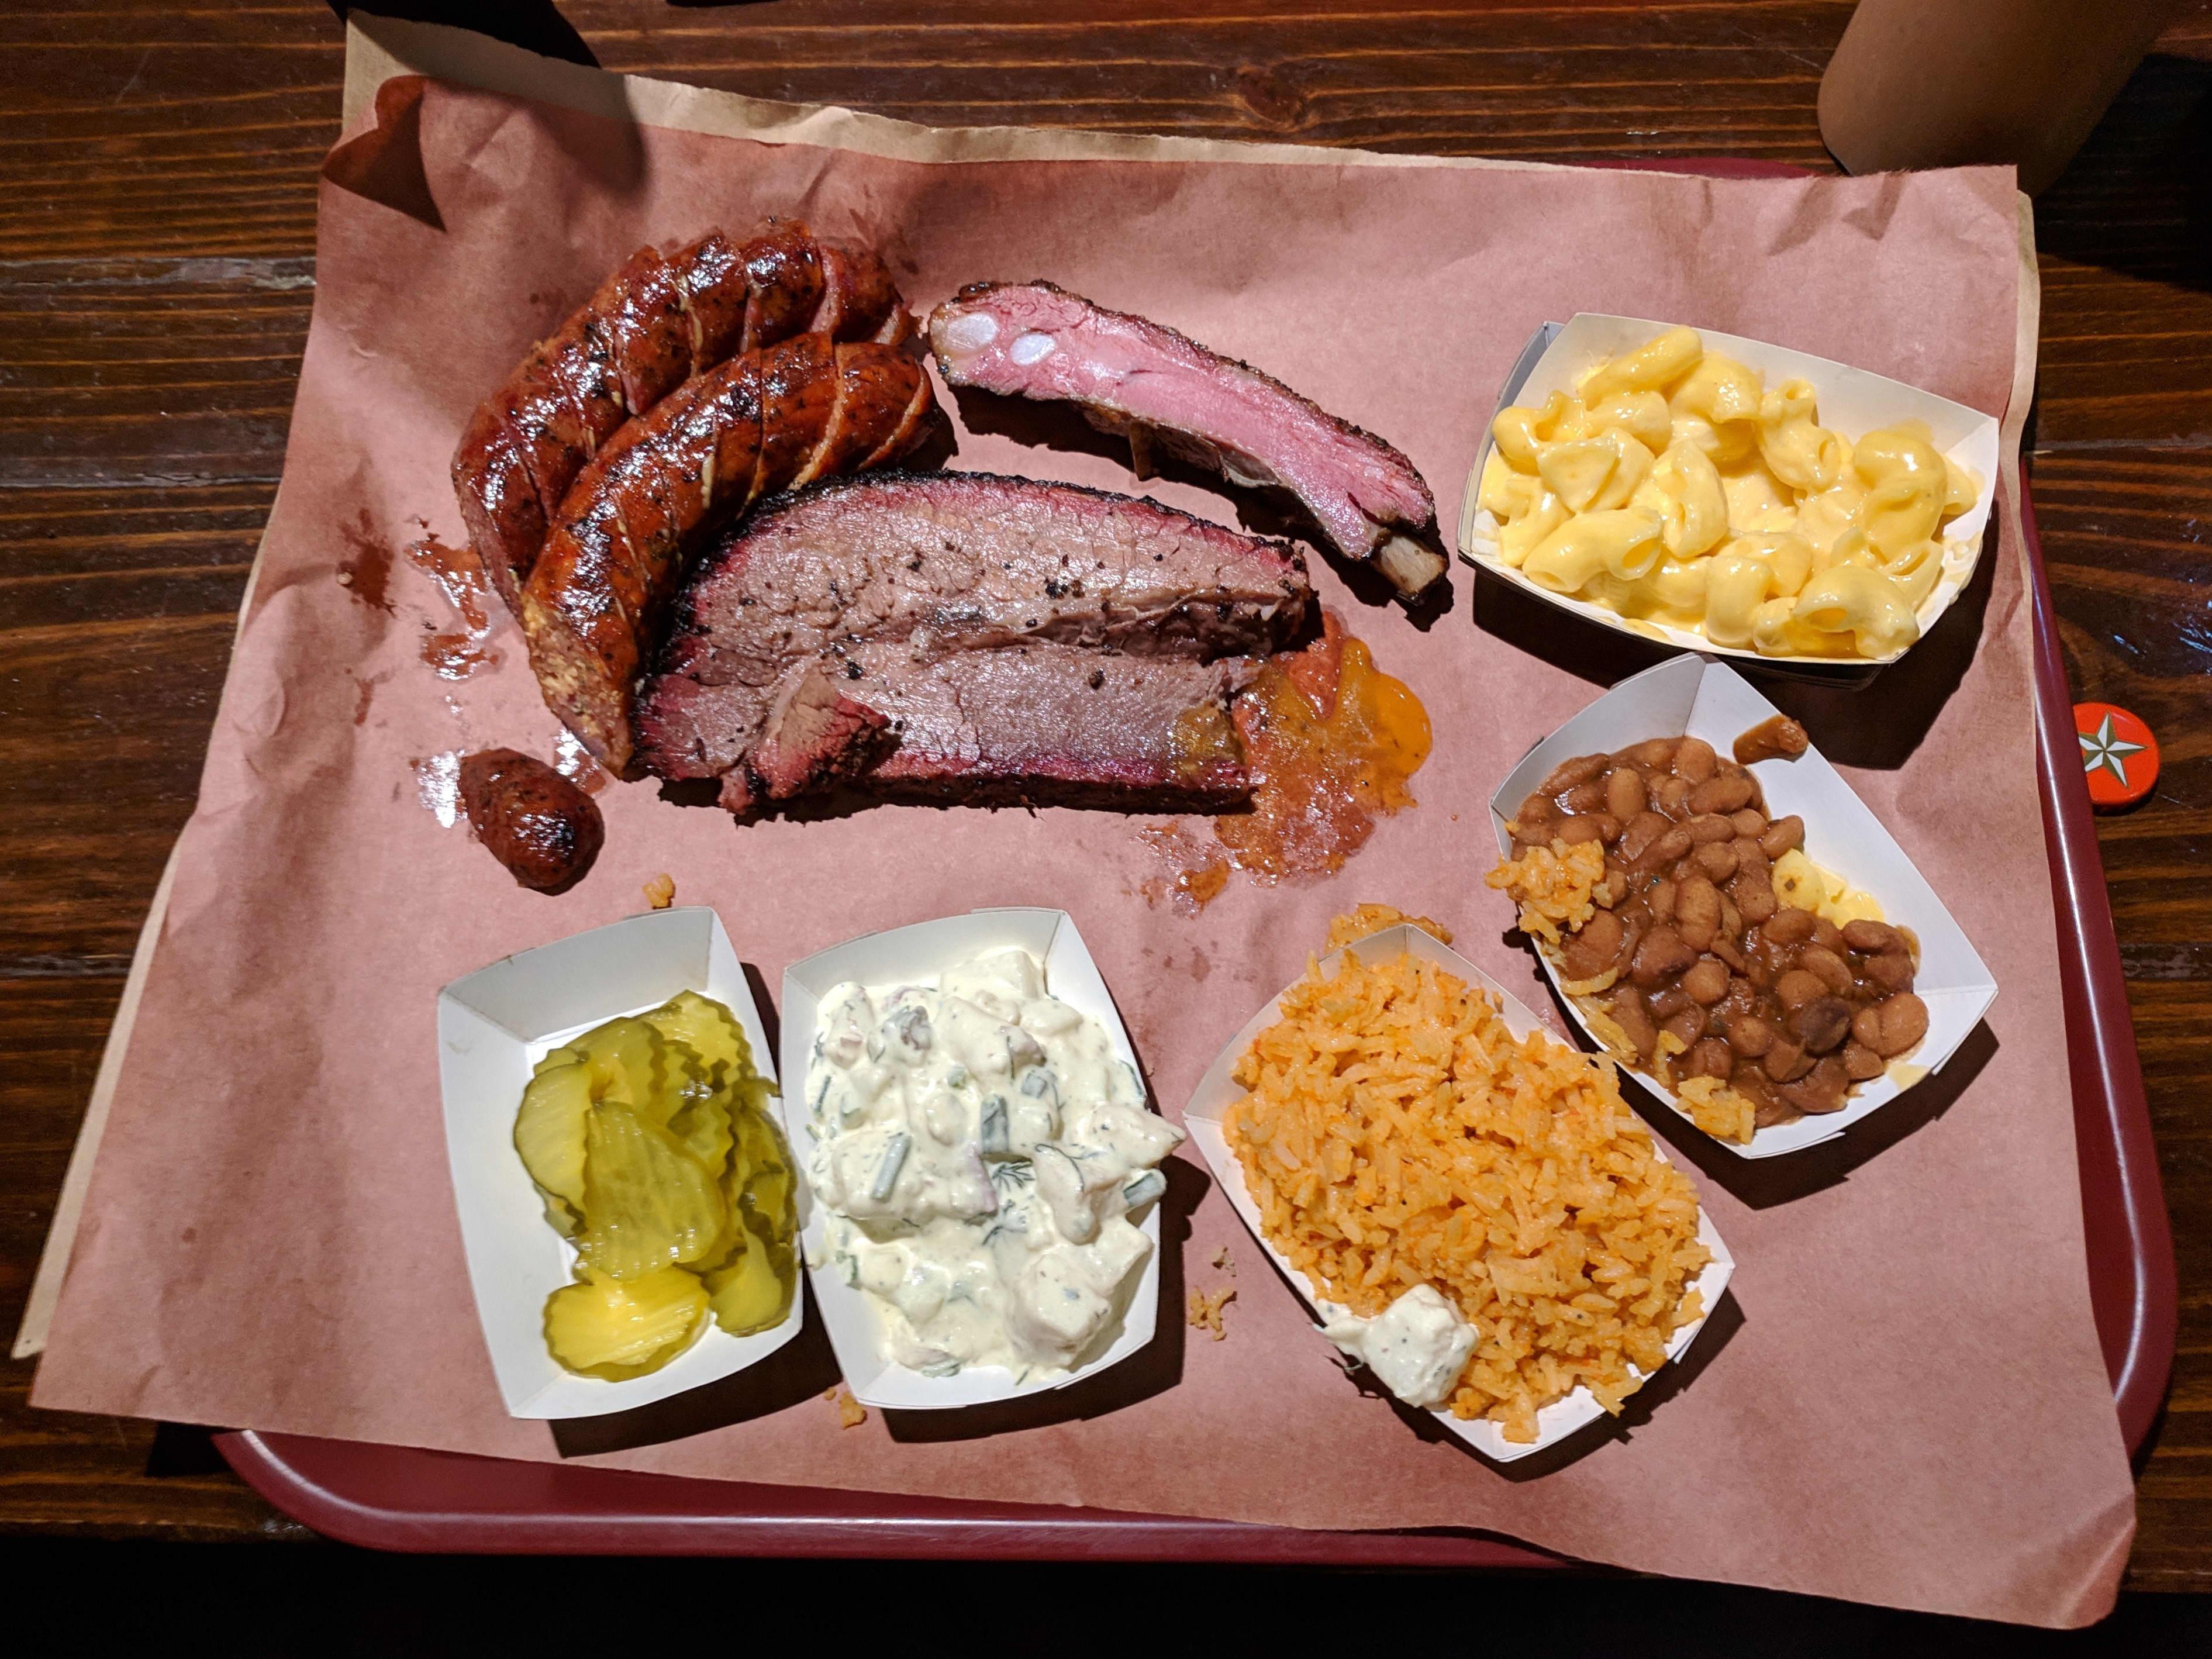 Austin Texas BBQ List Terry Blacks BBQ Brisket, Pork Ribs, Sausage, Beans, and Potato Salad